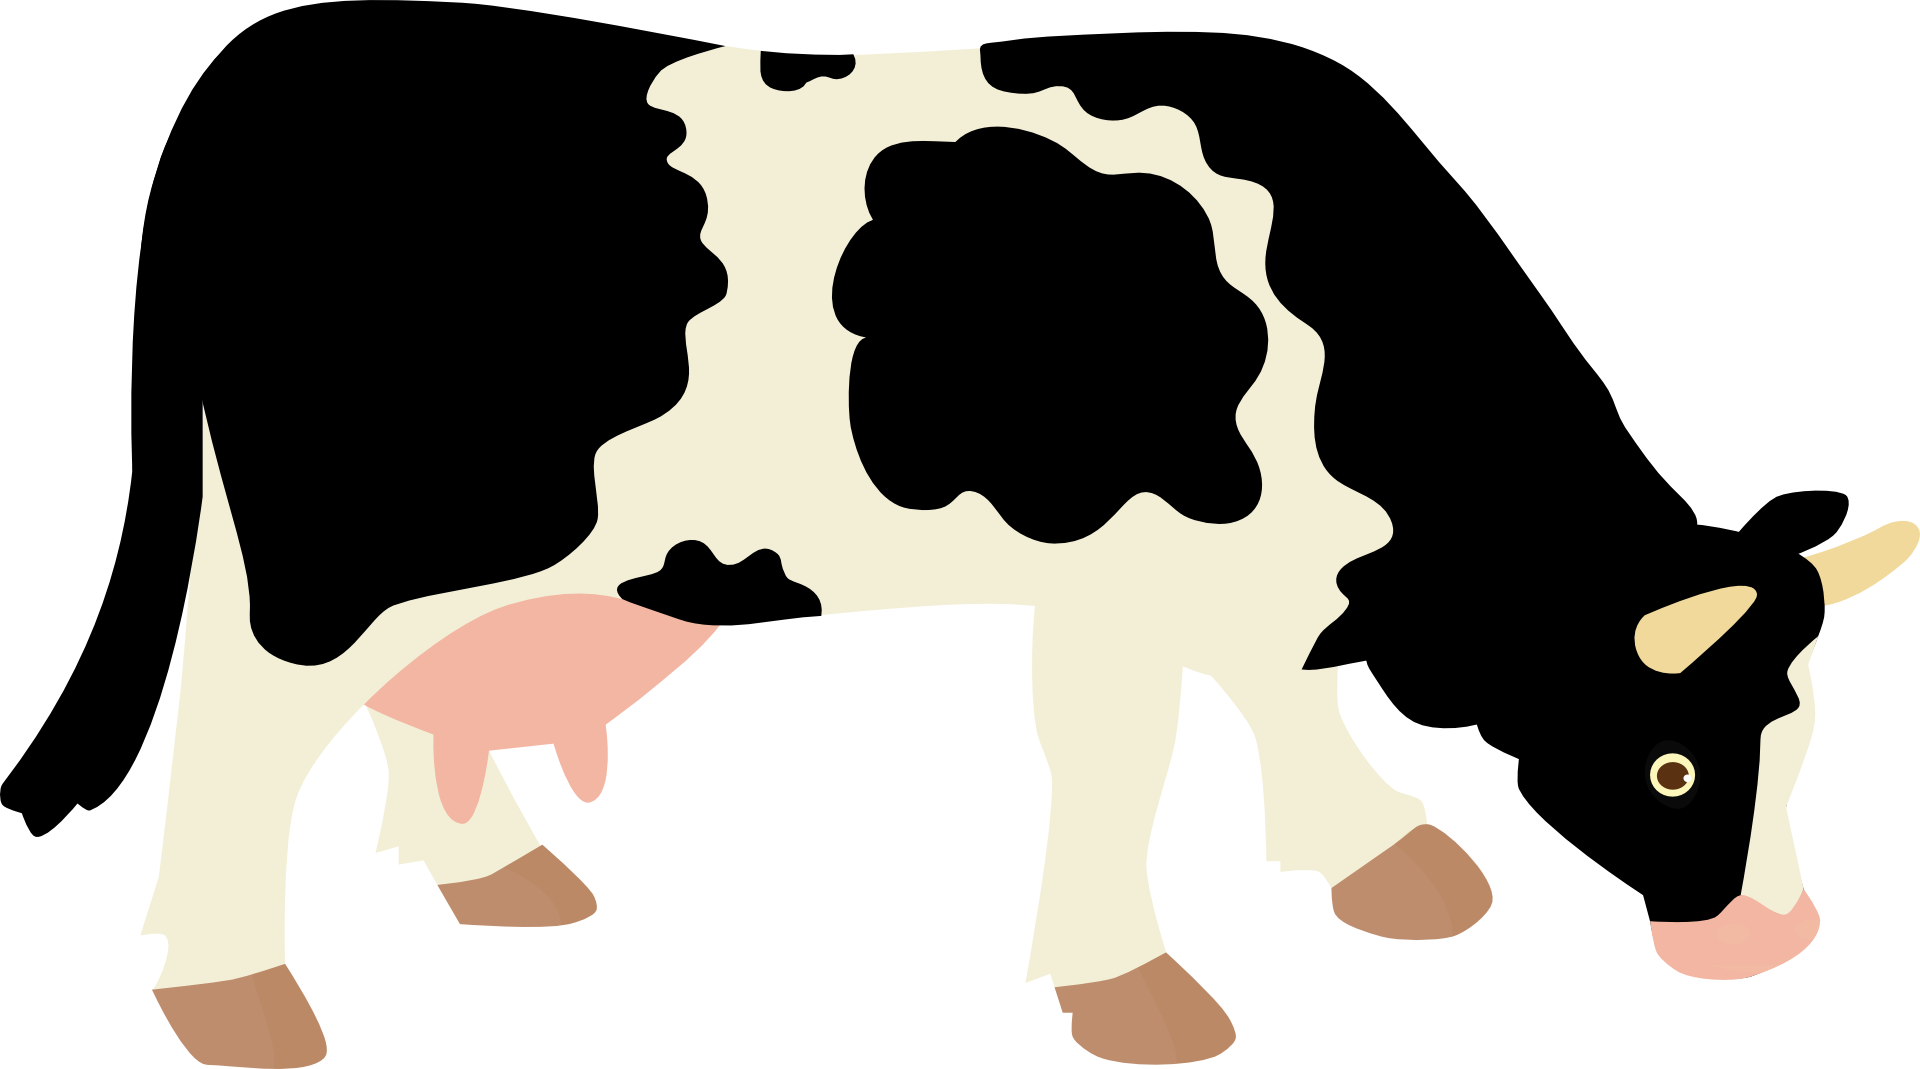 Why fda should ban. Cow clipart vet